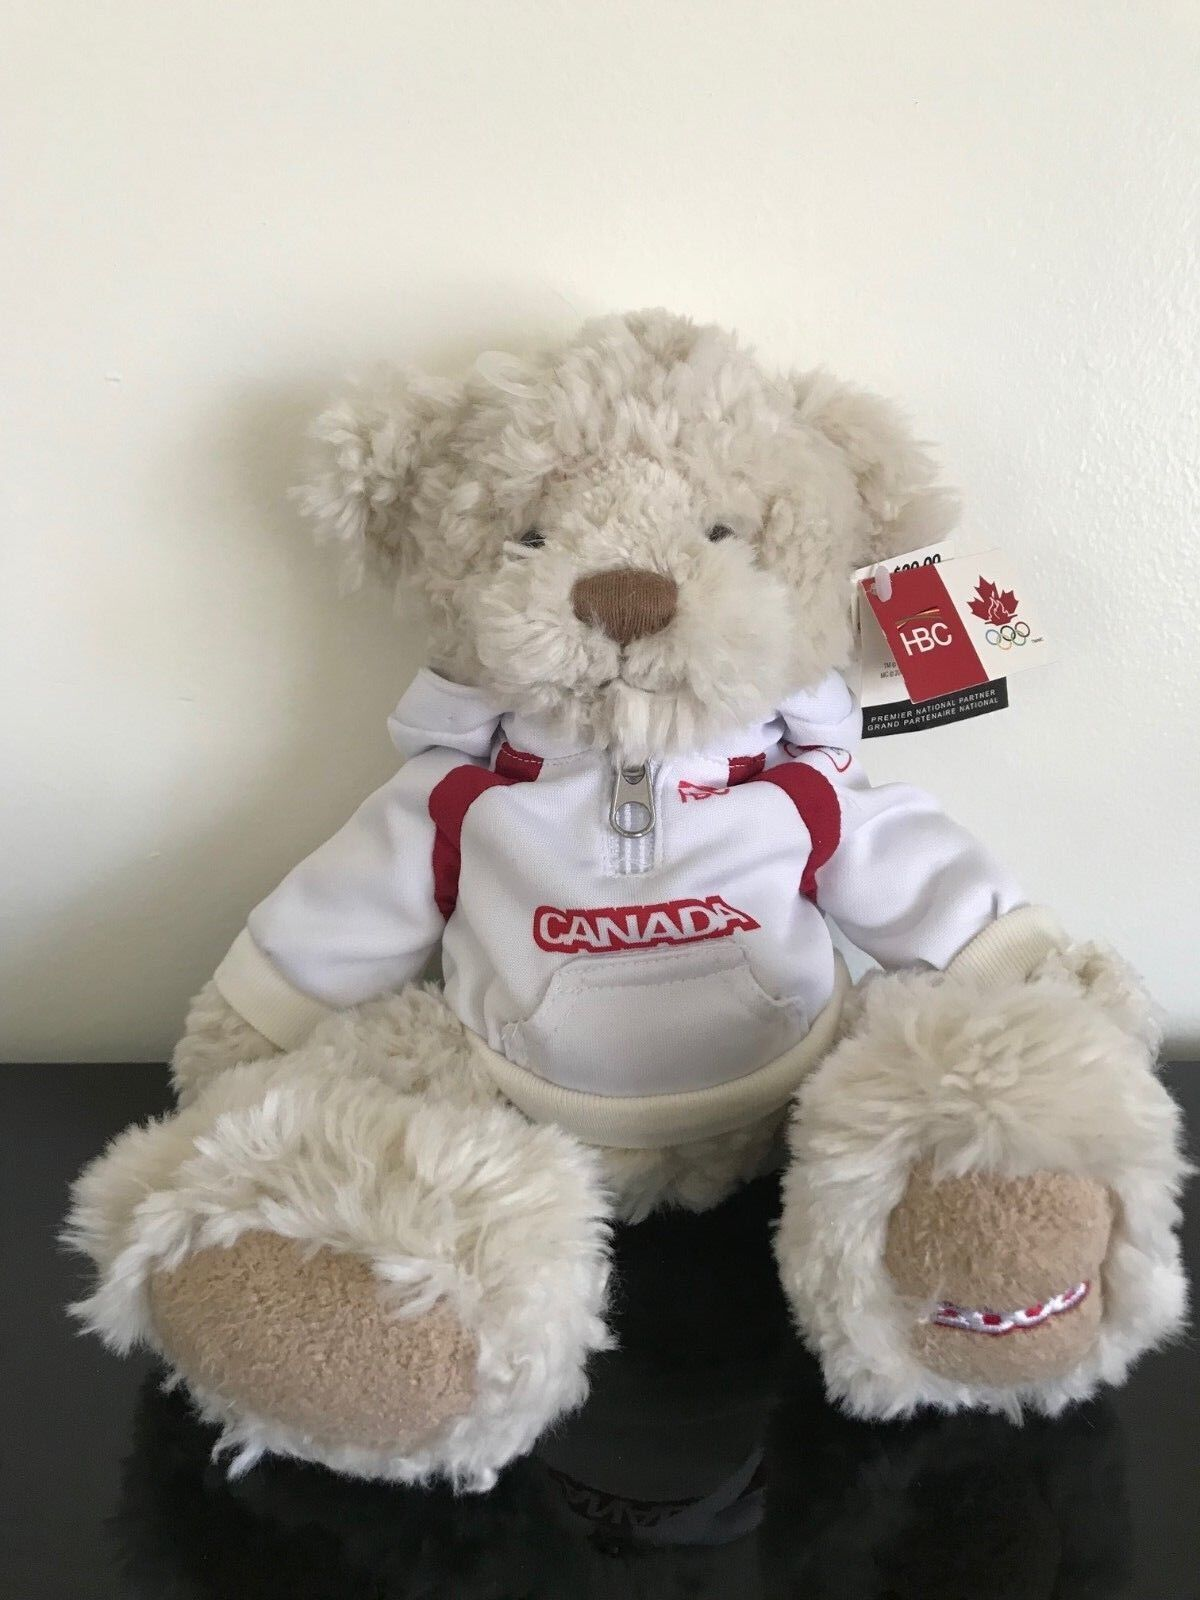 Hudsons Bay Company 2006 Canada Winter Olympic Bear 12 inch All Tags HBC